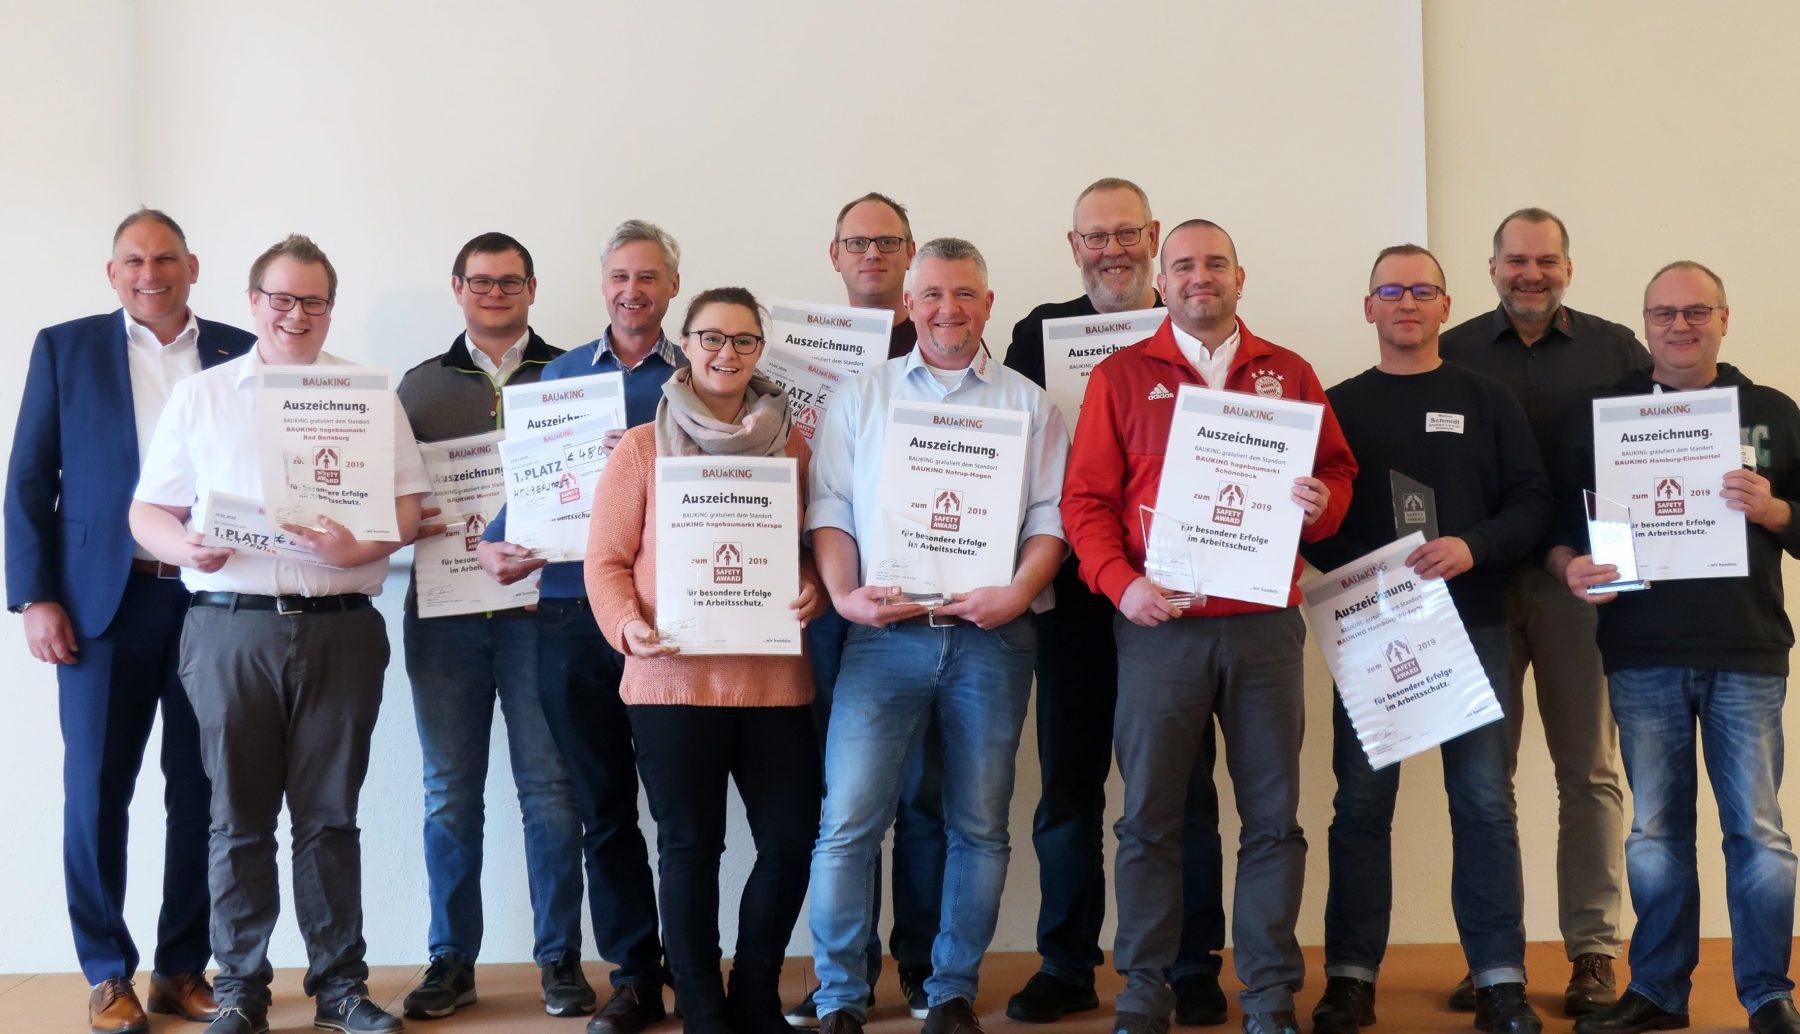 Den Safety Award übergaben Stefan Tessel (2.v.r) und Personaldirektor Marc-Oliver Windbacher (l.).